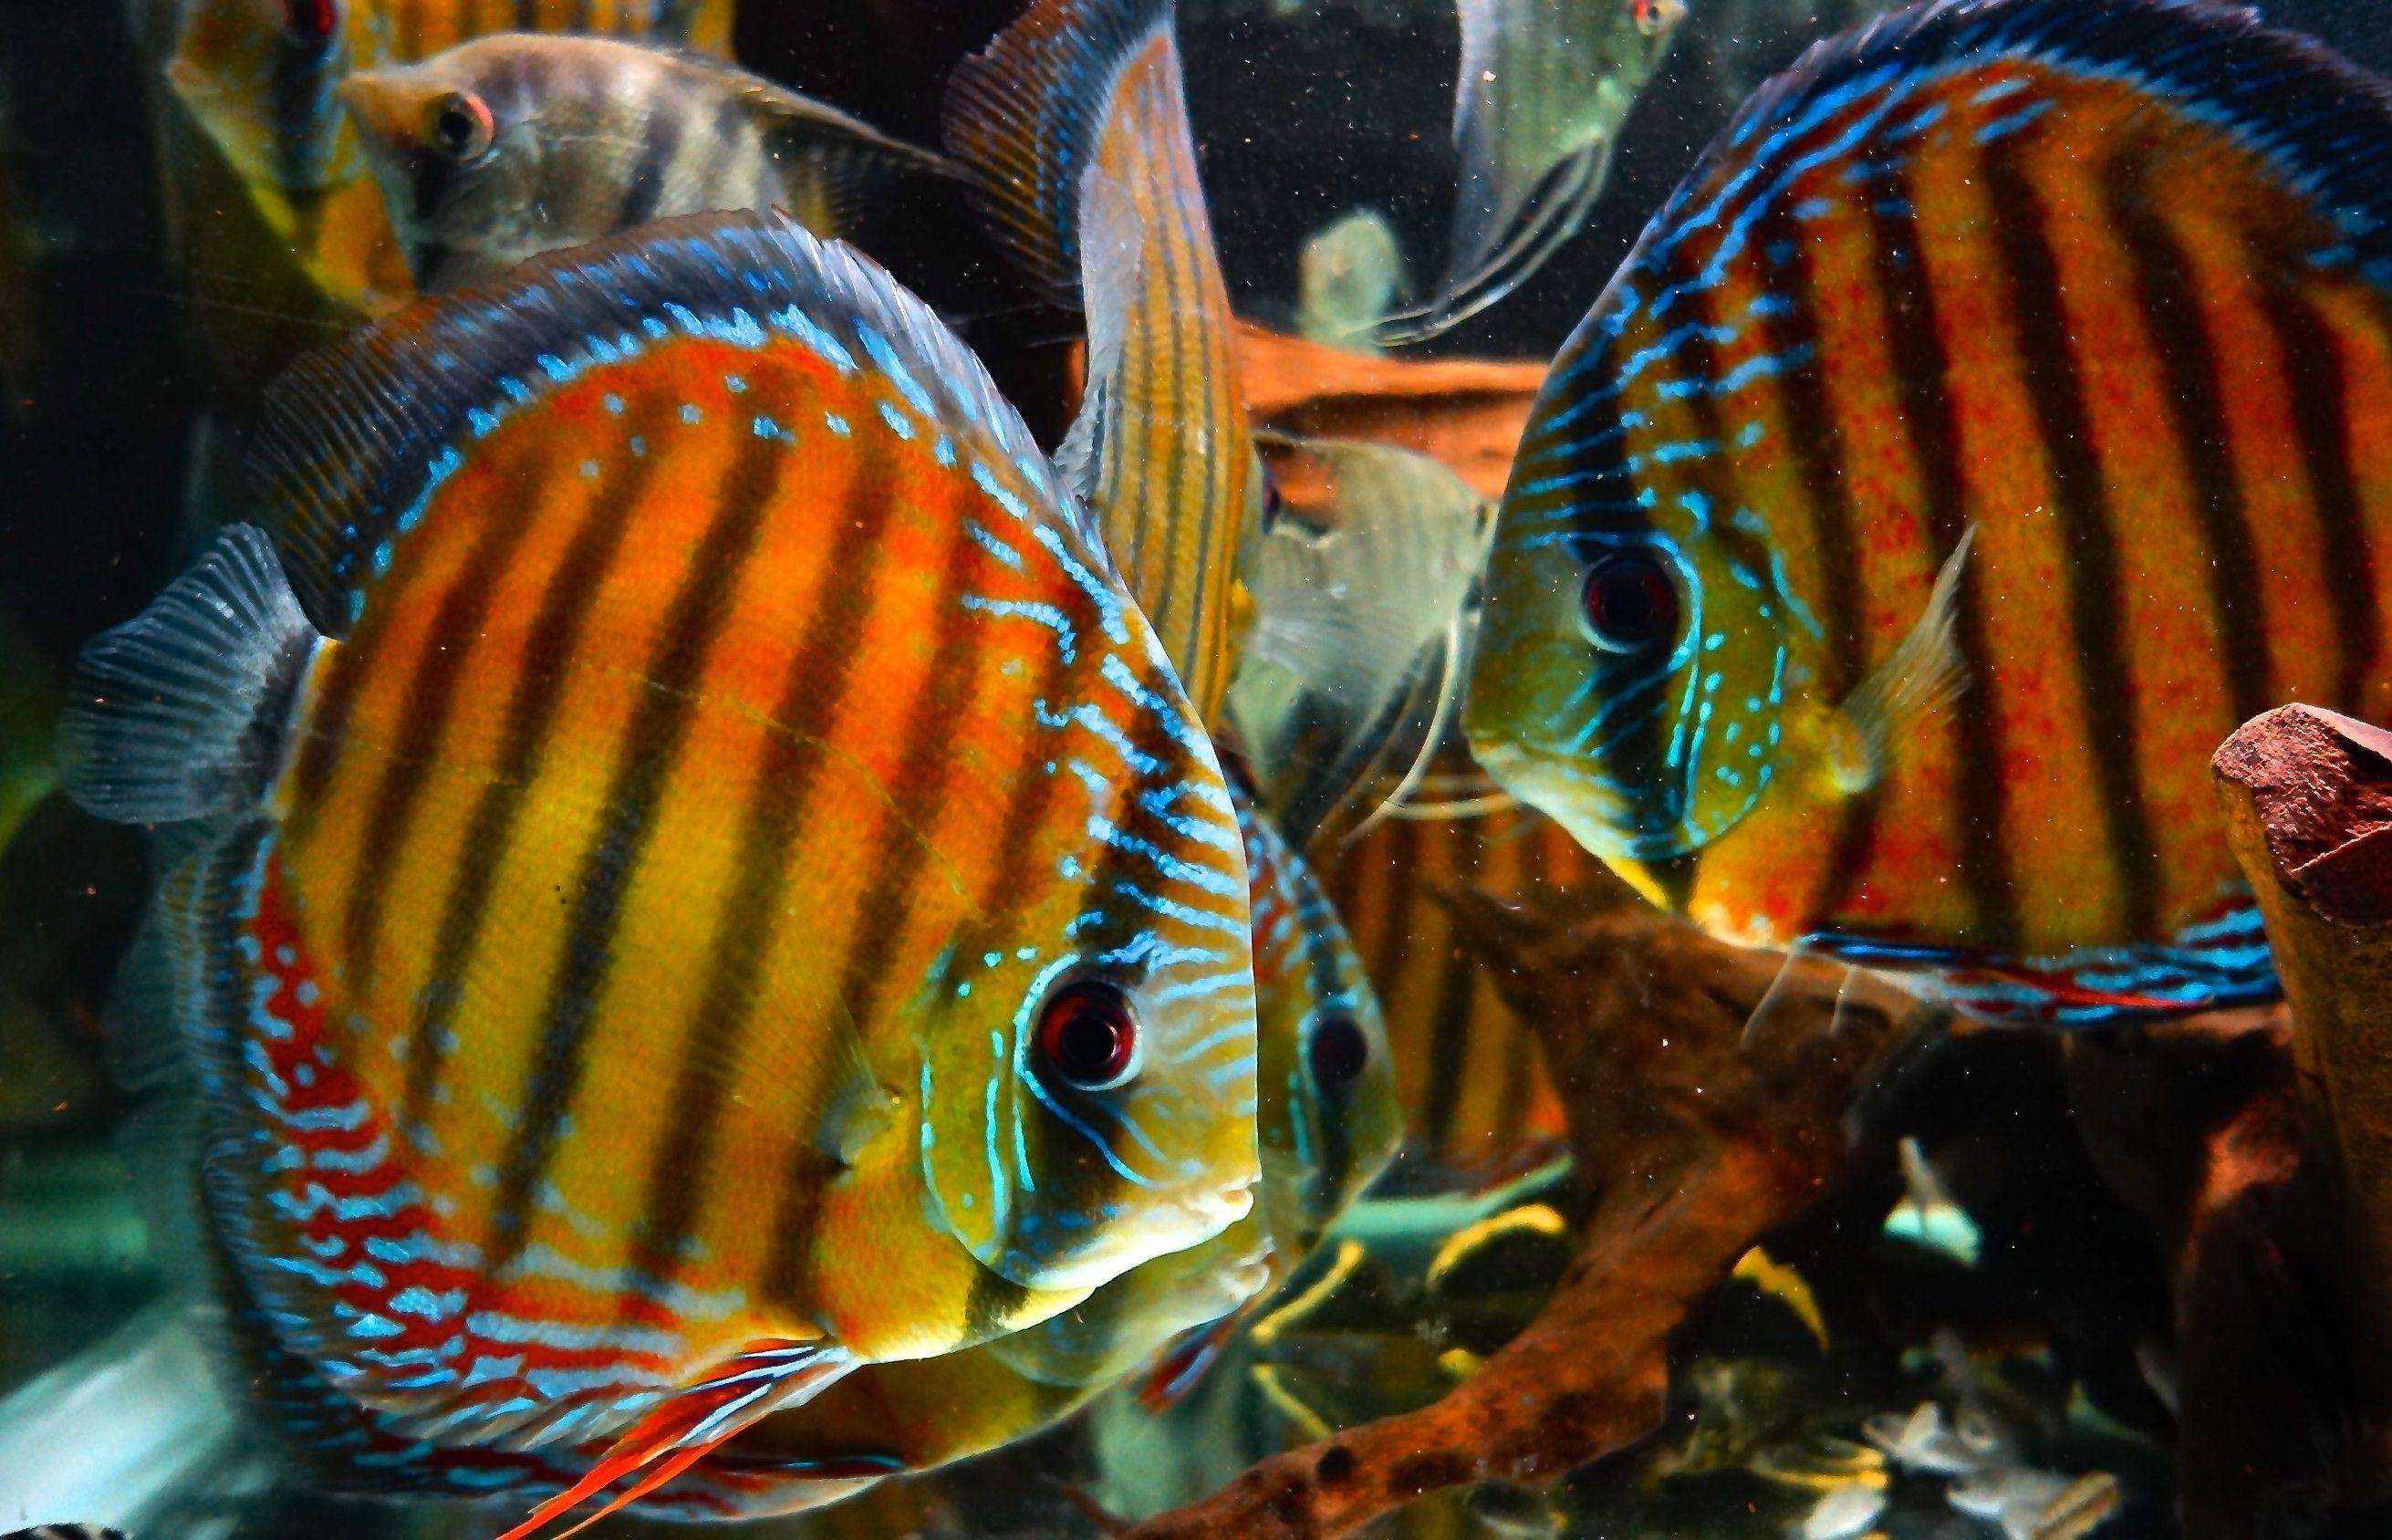 discus fish - Google Search